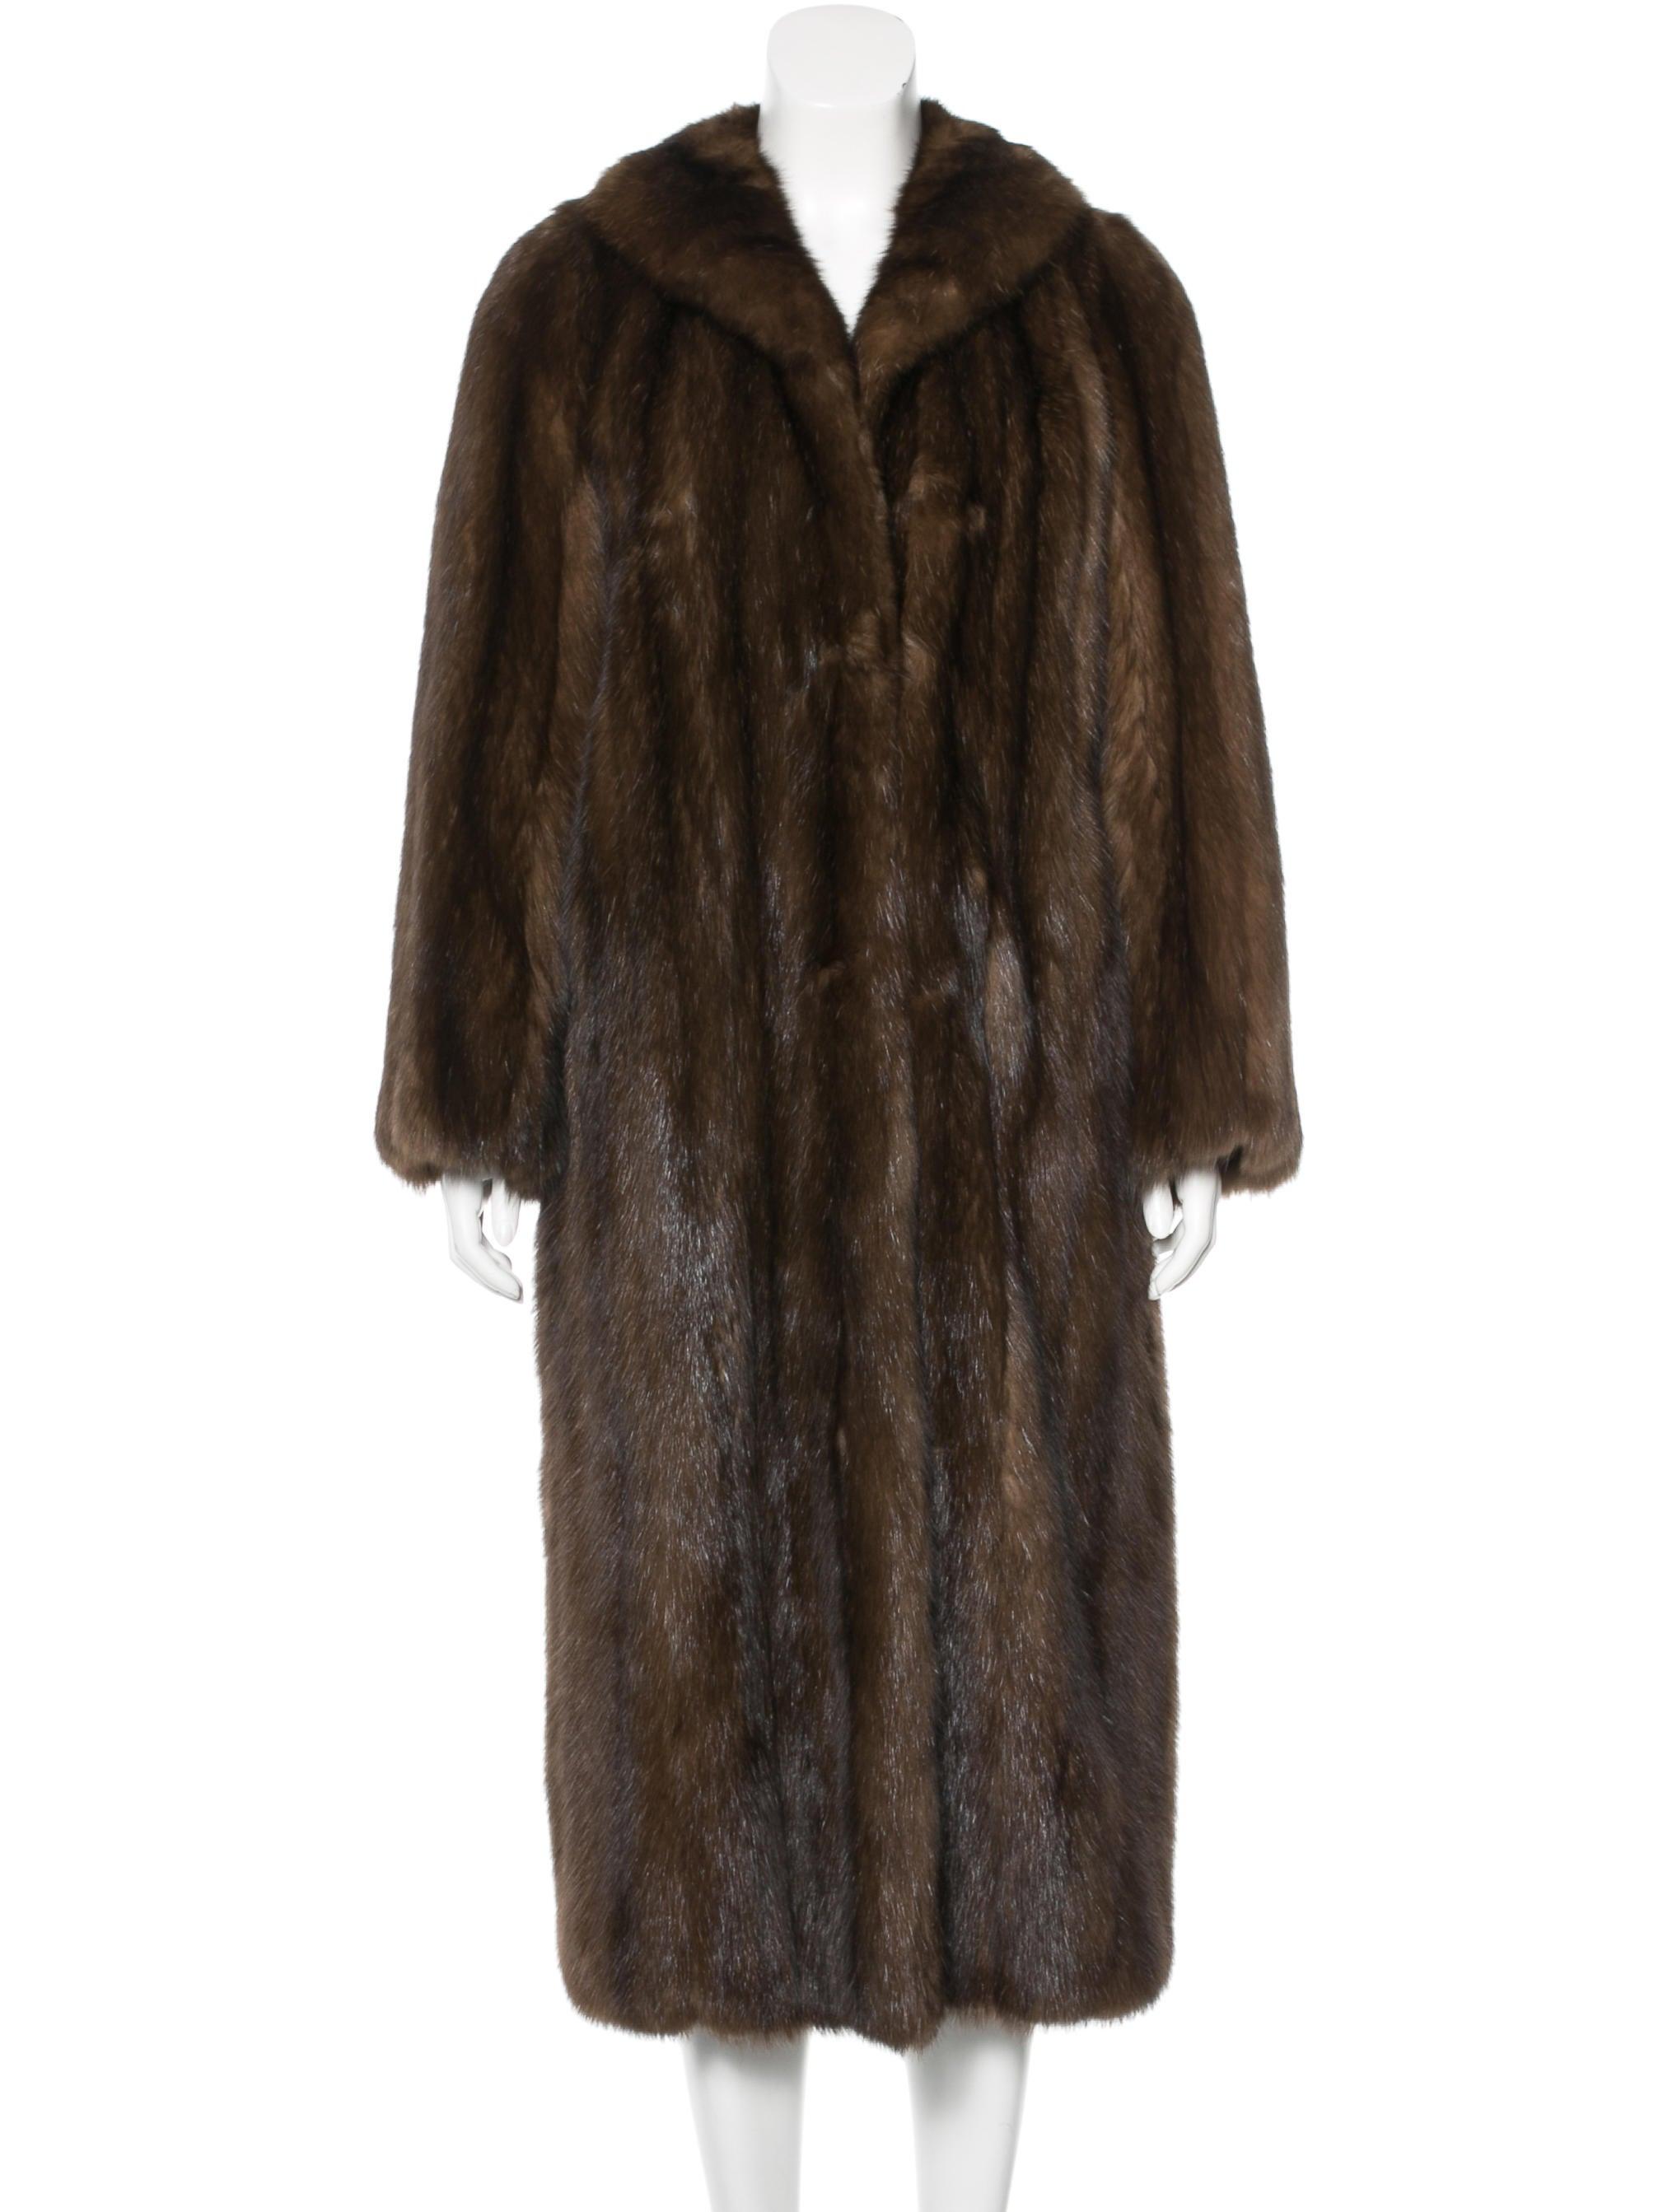 Fur Sable Fur Coat Clothing Fur21442 The Realreal